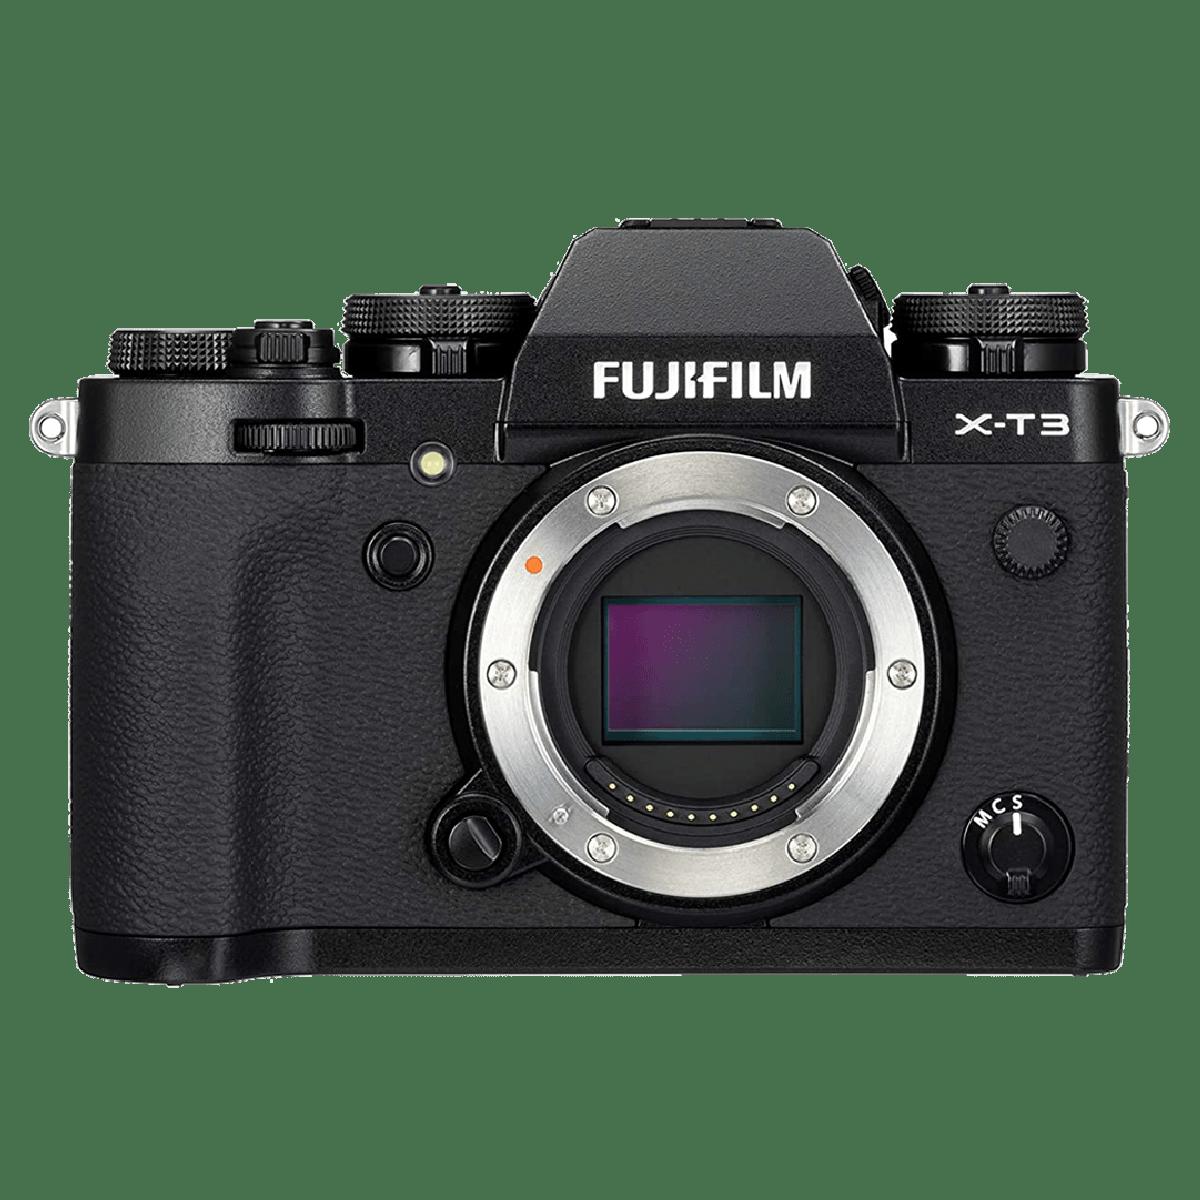 Fujifilm X-T3 26.1MP Mirrorless Camera (Color Chrome Effect, 16588559, Black)_1